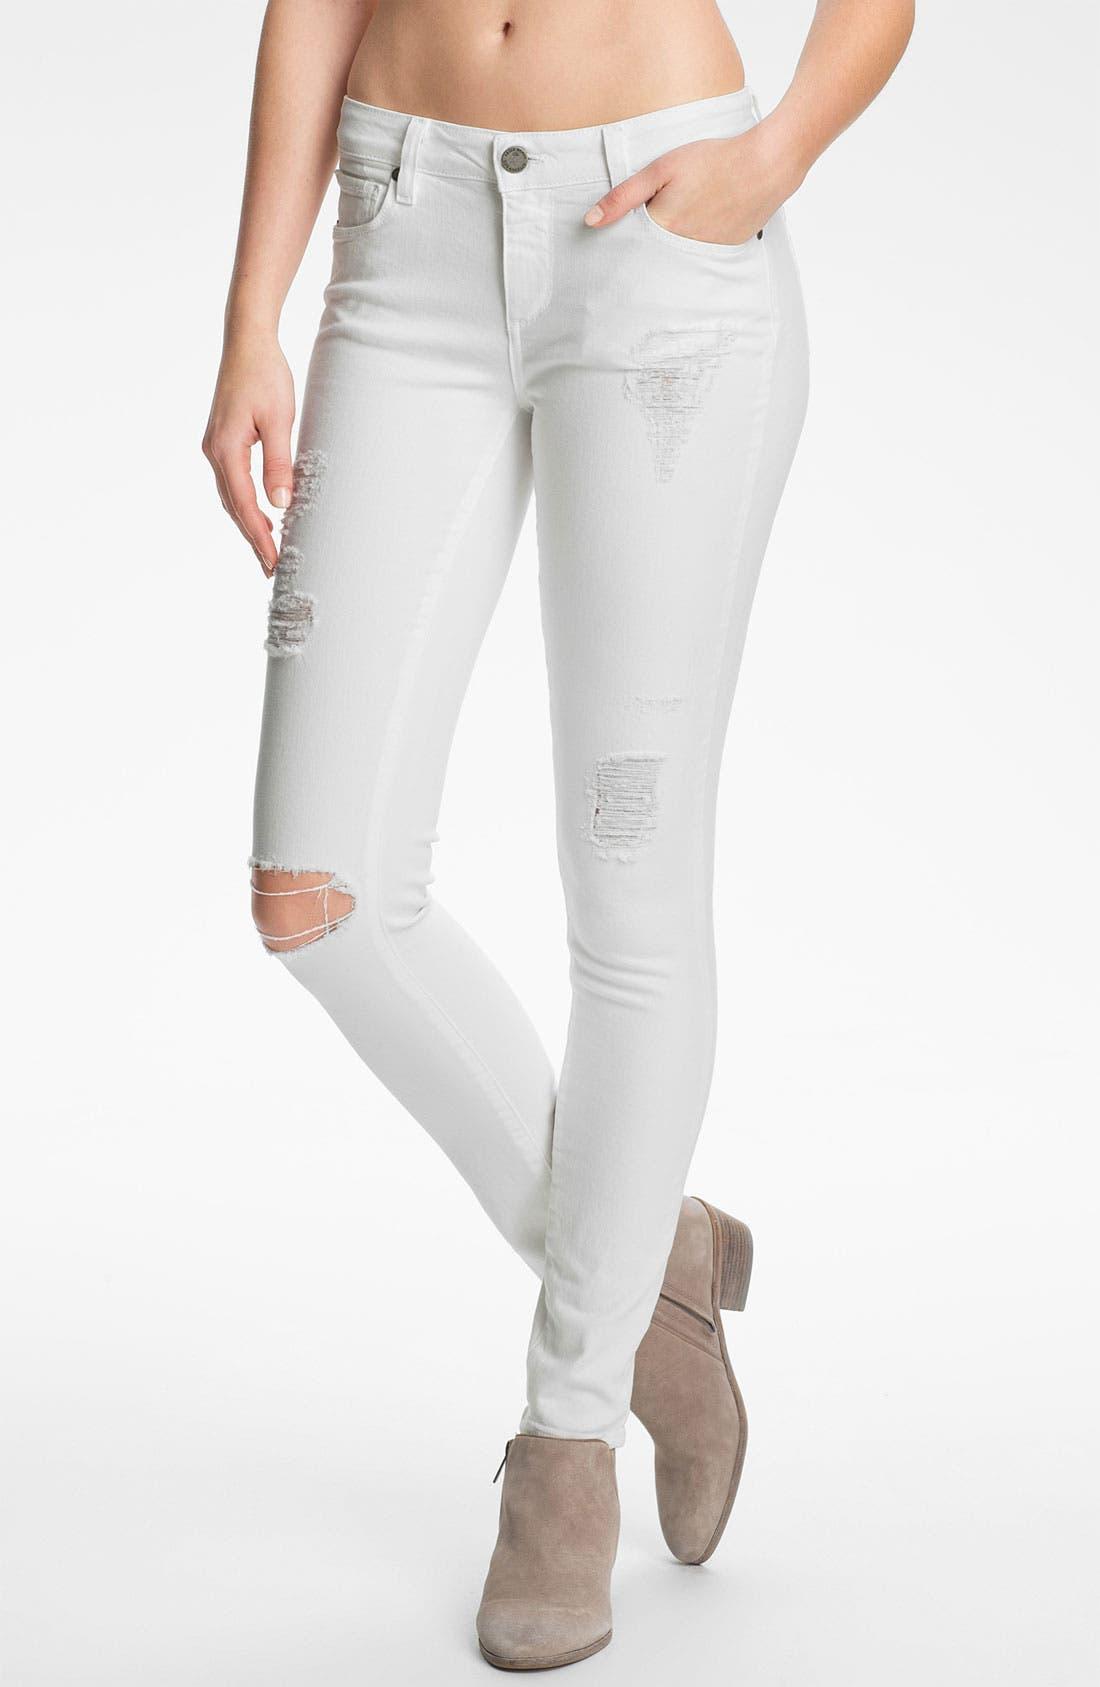 Alternate Image 1 Selected - PAIGE 'Verdugo' Destroyed Ultra Skinny Jeans (Optic White Deconstruction)